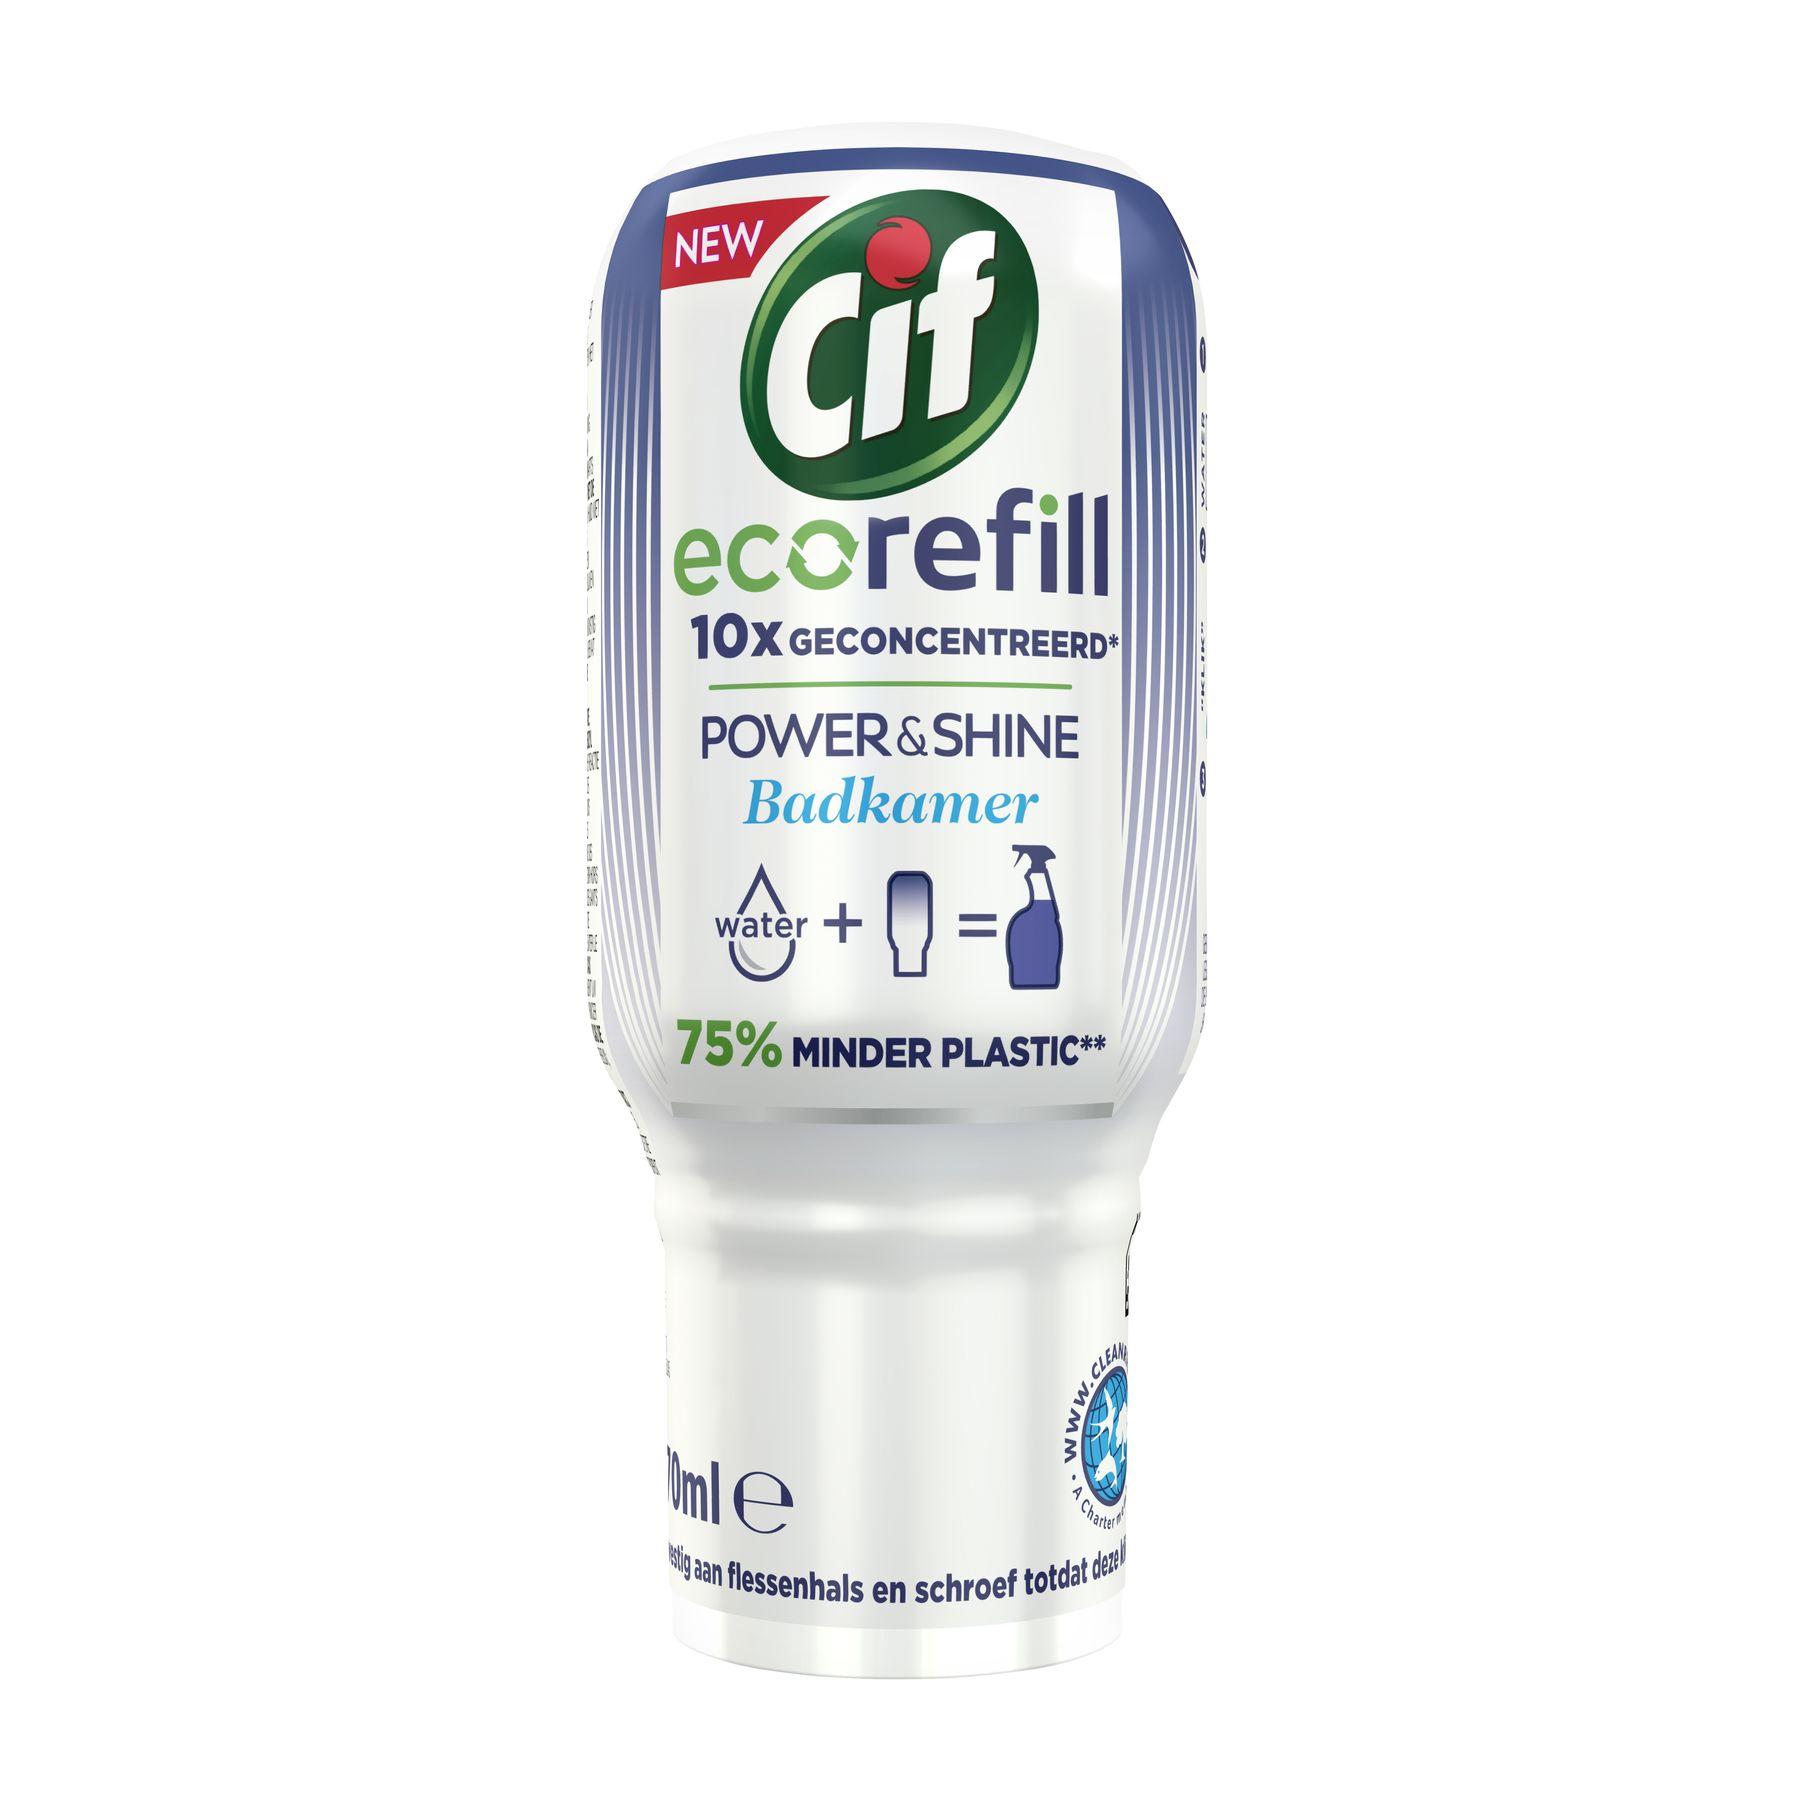 Cif Power & Shine Ecorefill Bathroom 70ml